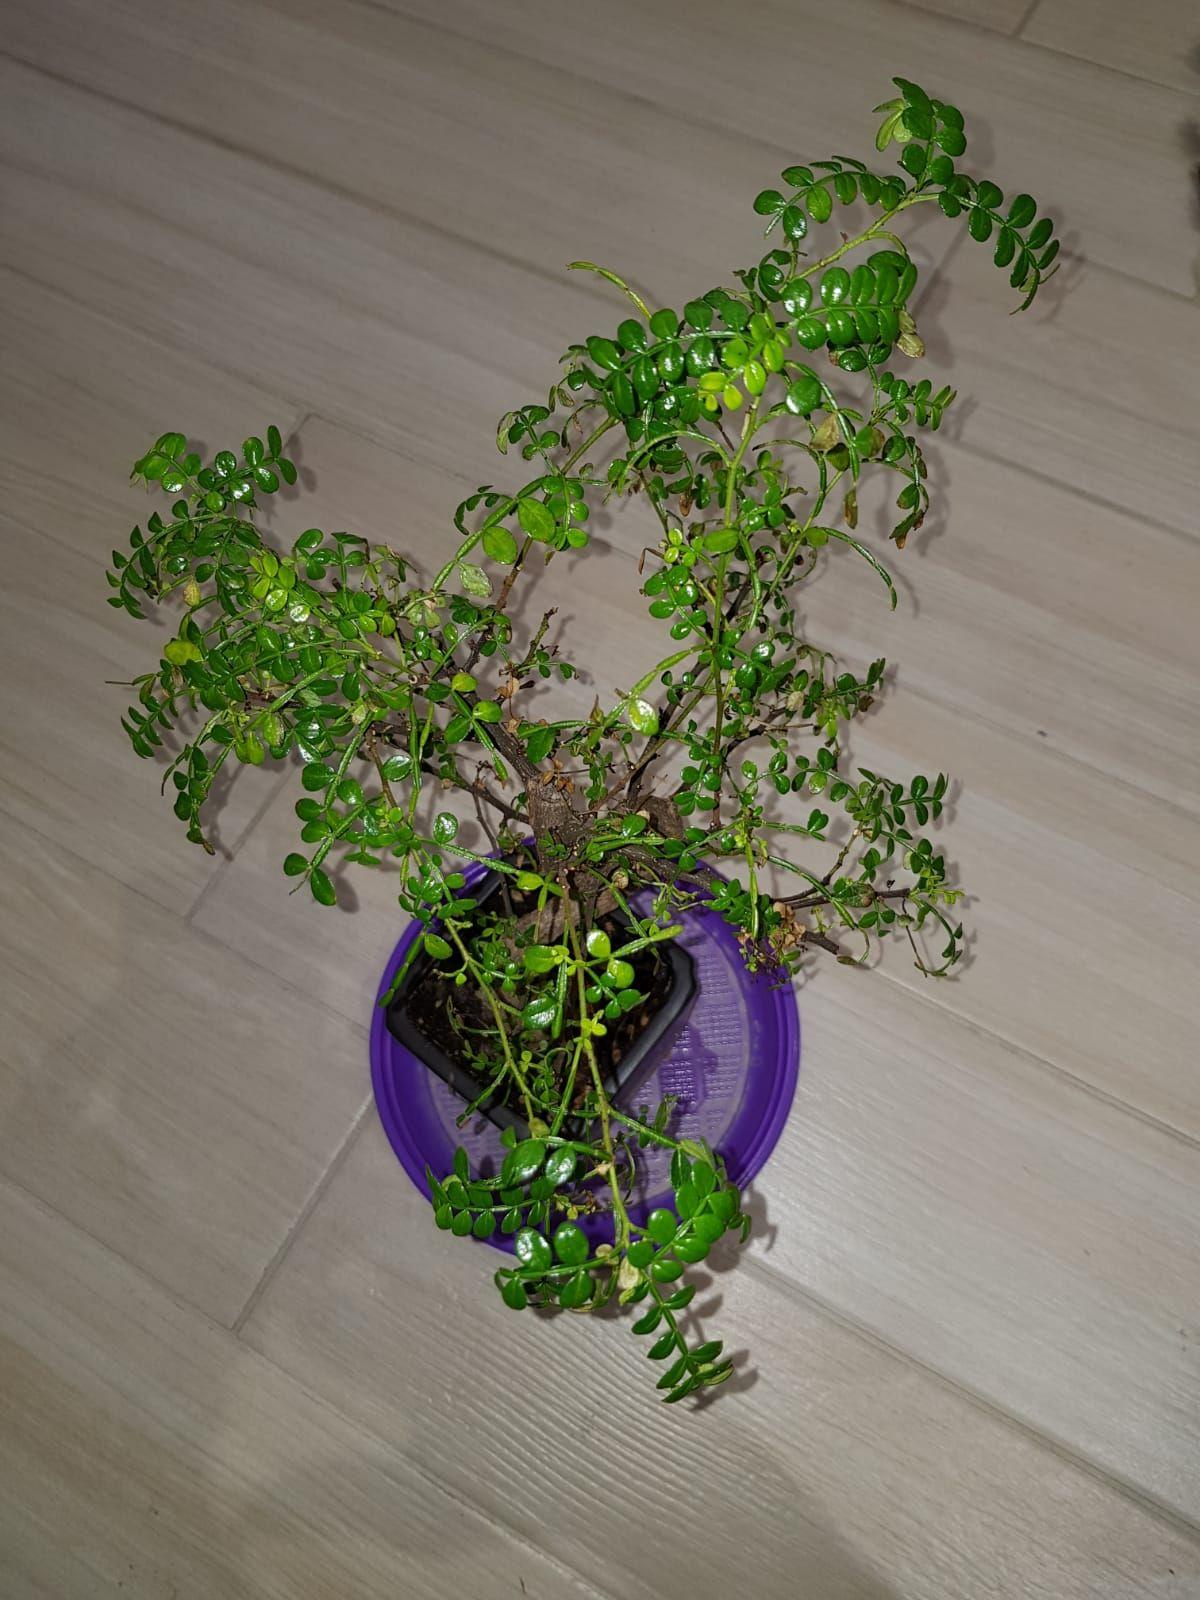 primo bonsai pepper tree: chiedo consigli B71c98acb5dfc3401fd2aa13d2e00630